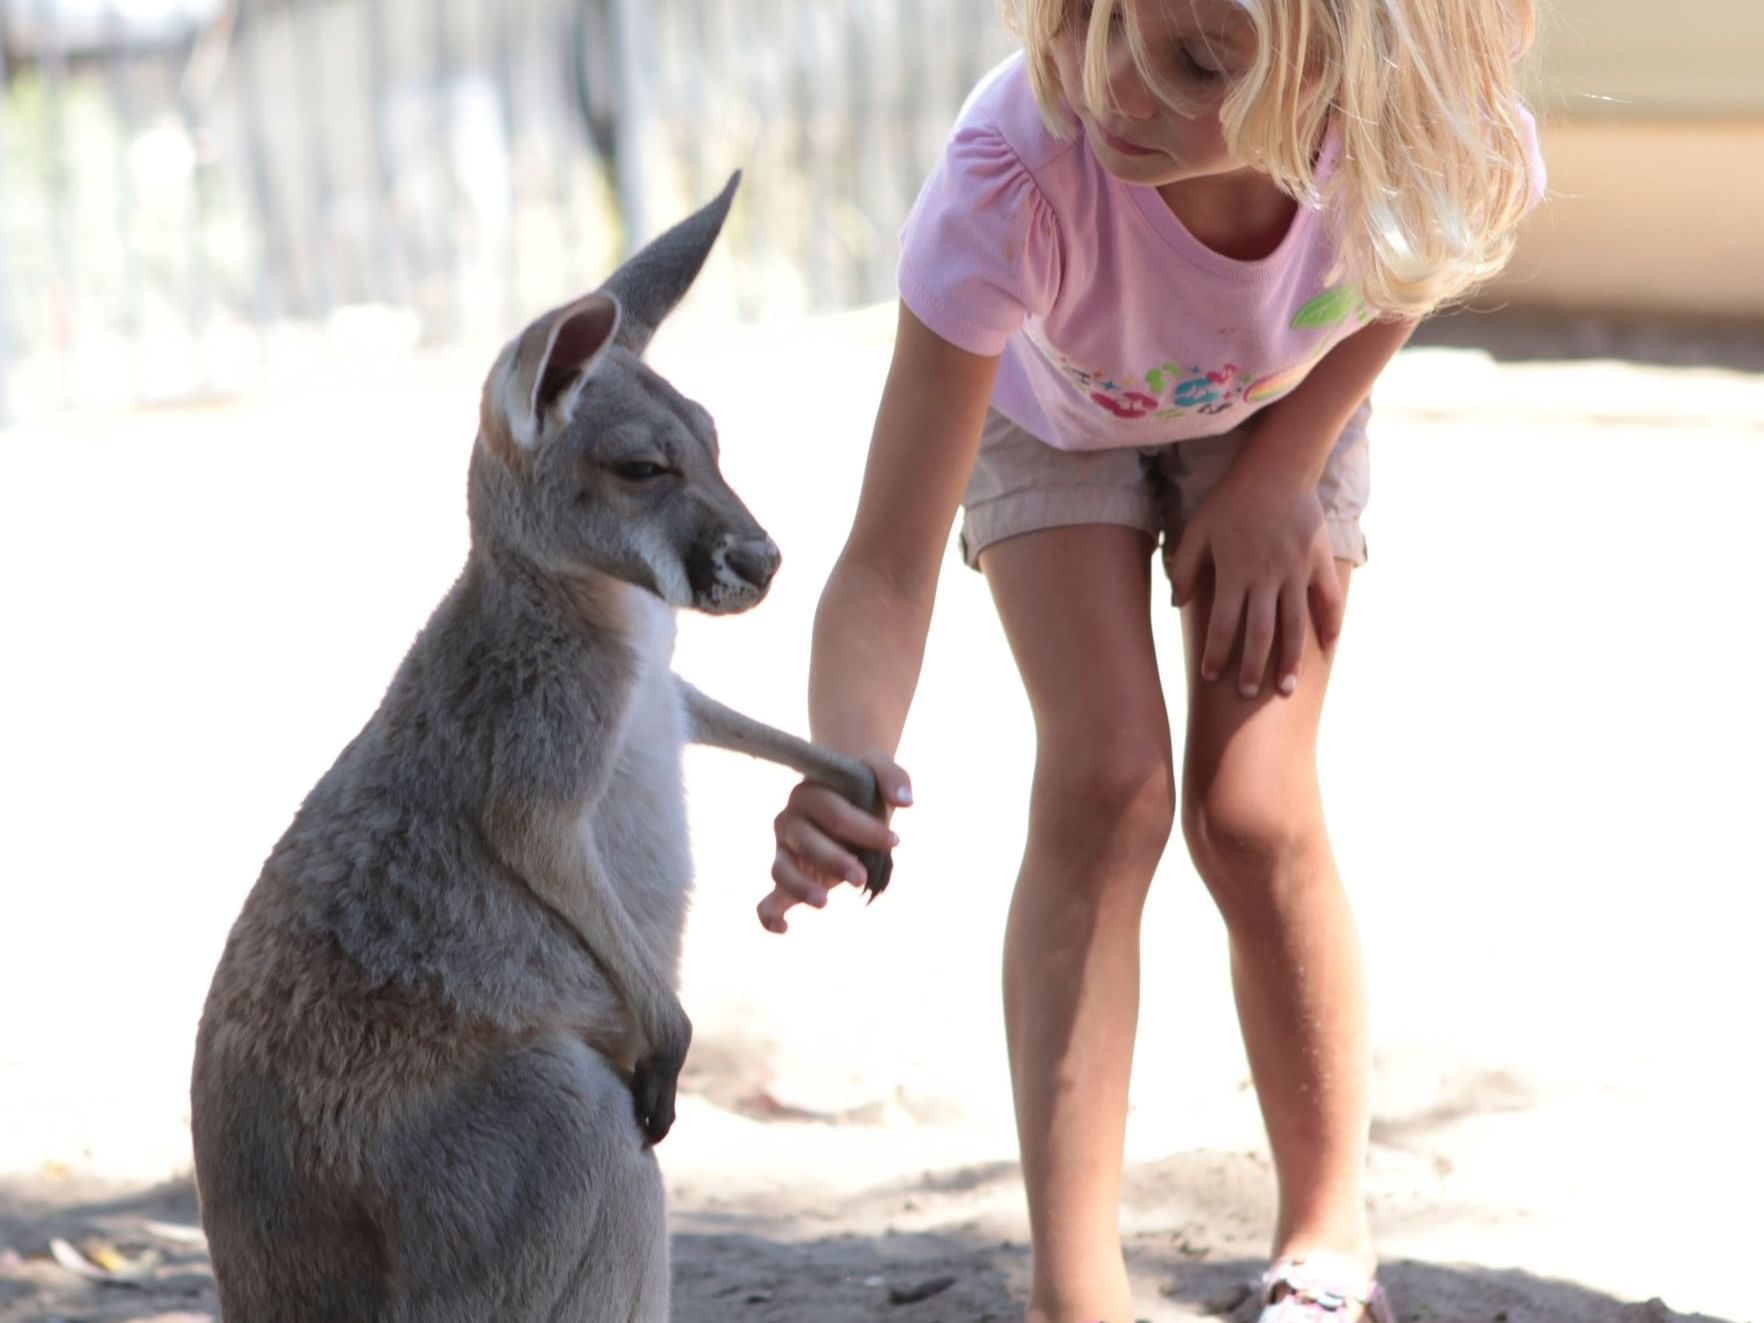 Child with Kangaroo